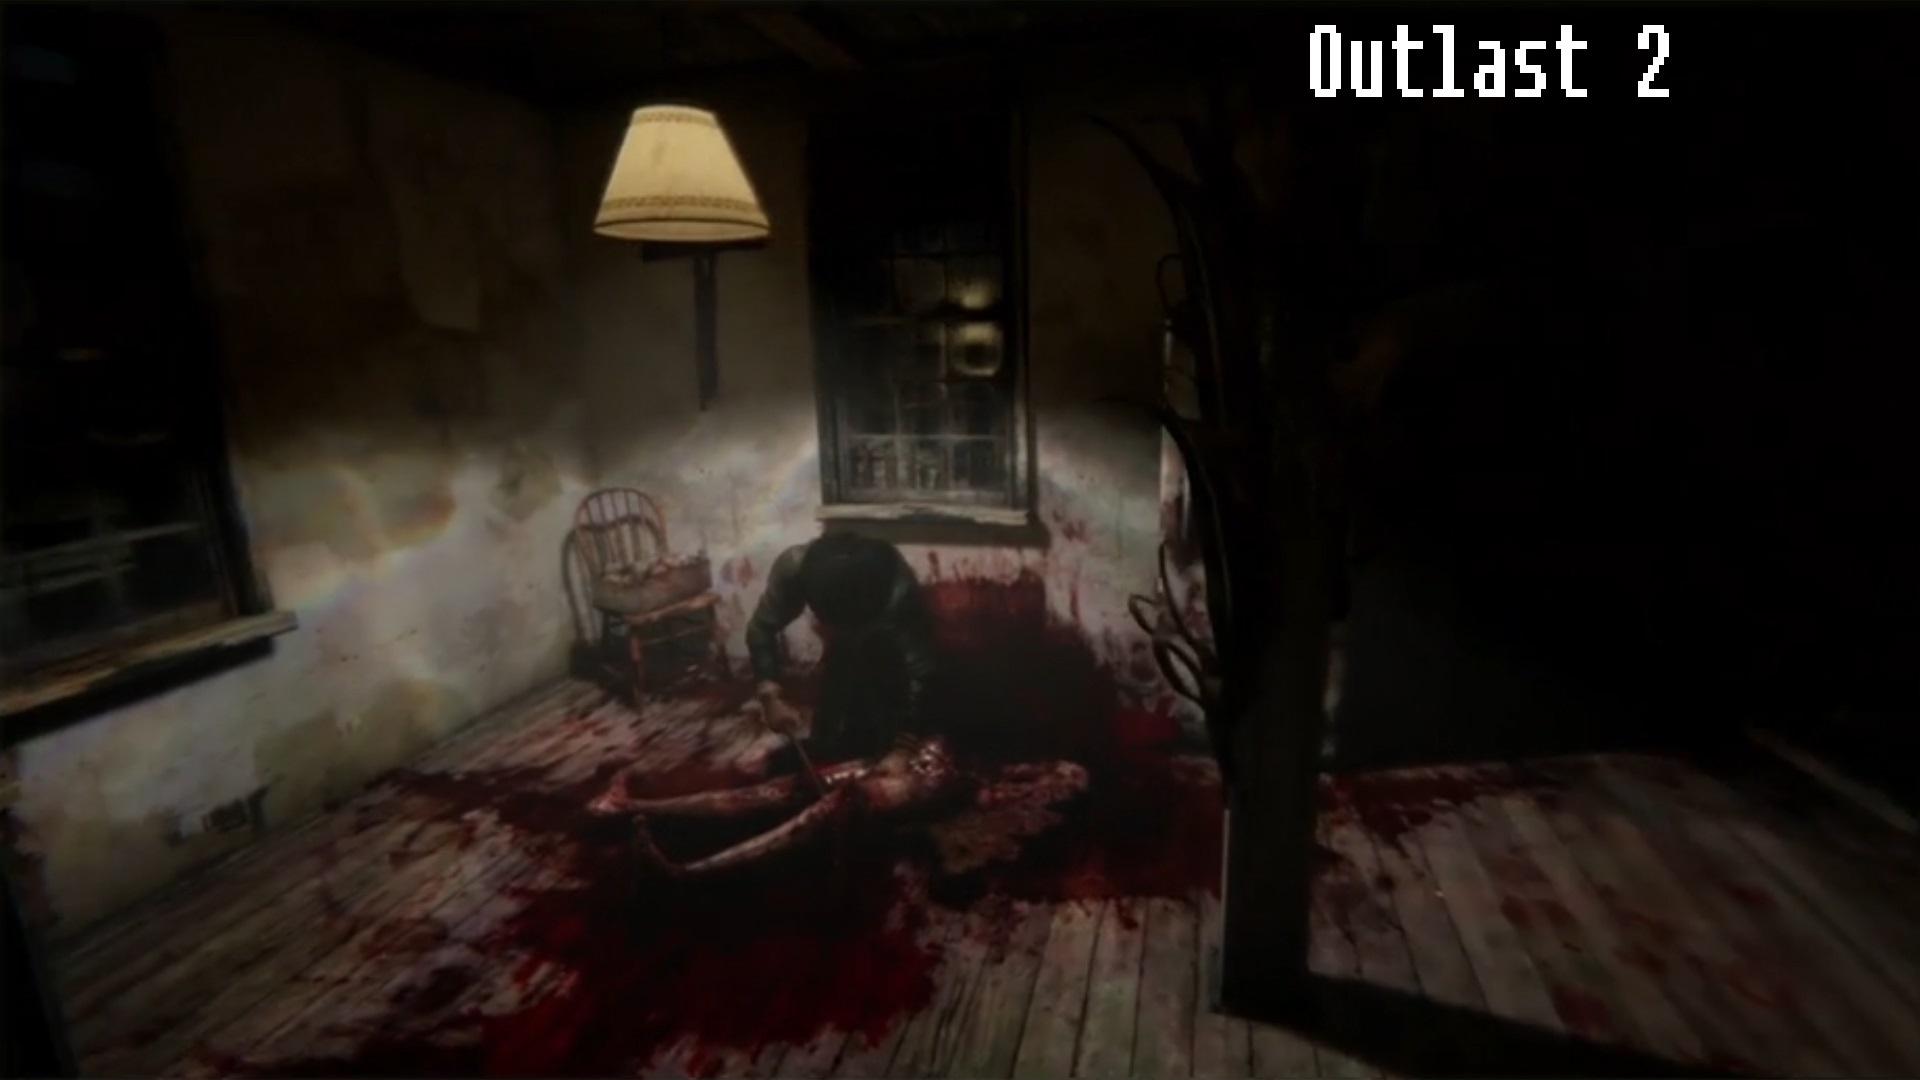 [Image: Outlast-2-Crack-Full-PC-Game-Free-Download.jpg]